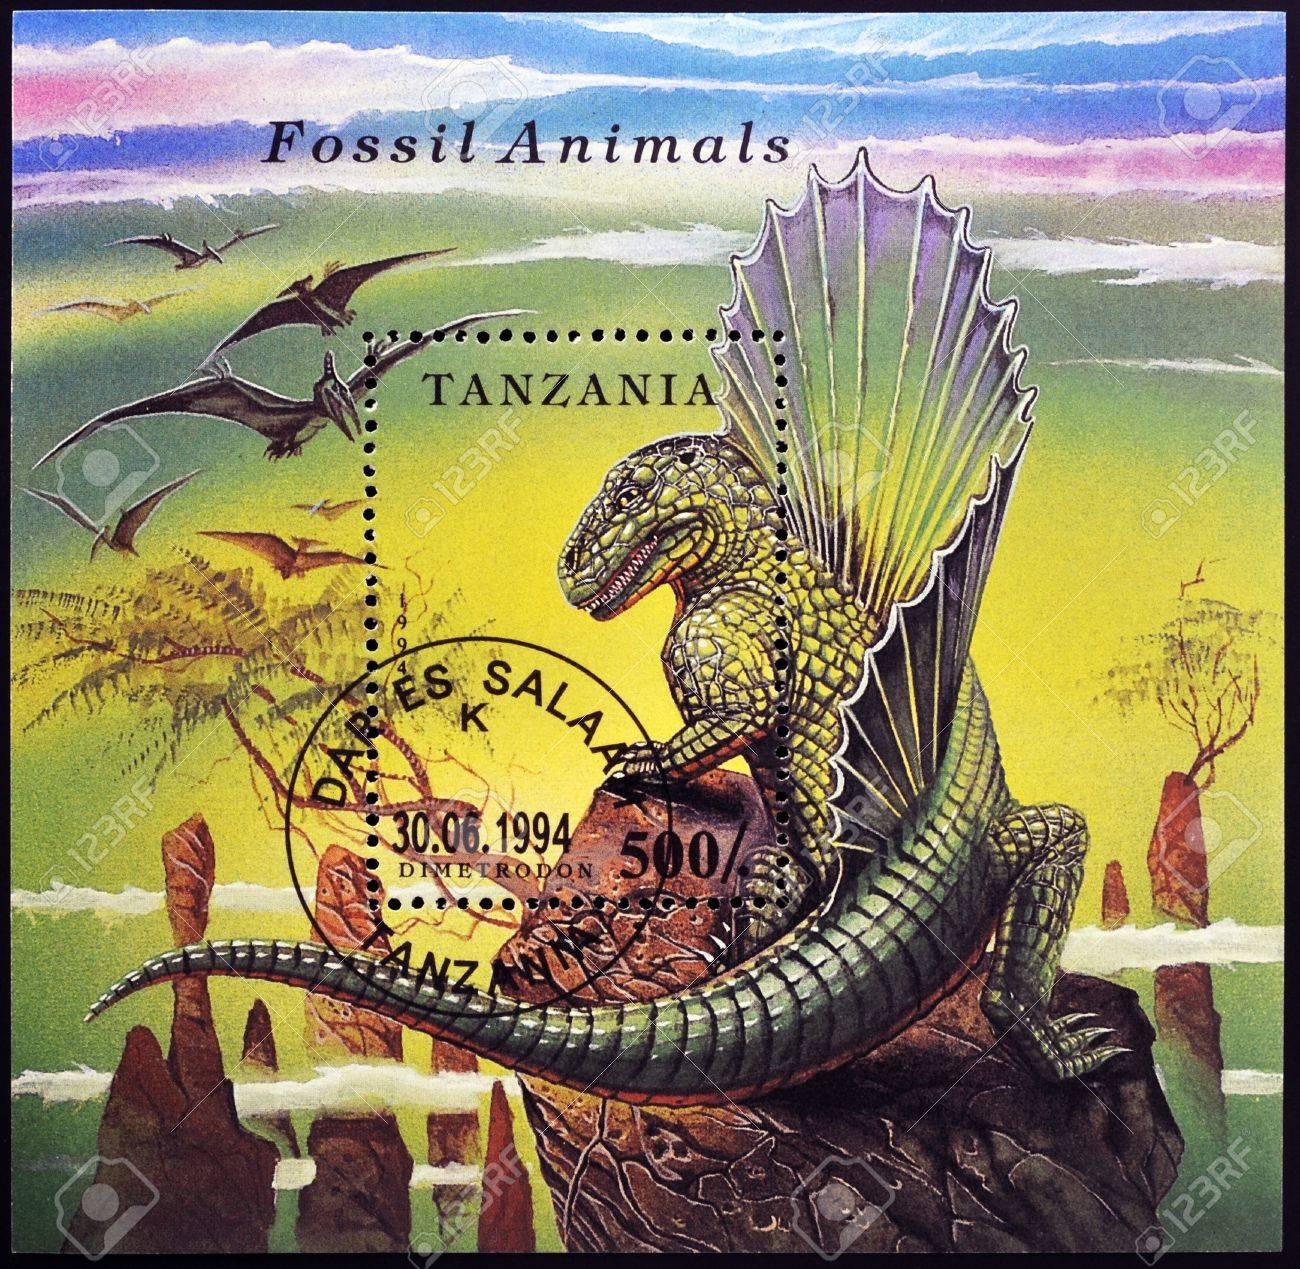 TANZANIA - CIRCA 1994: A stamp printed in Tanzania dedicated to fossil animals, shows a dimetrodon, circa 1994 Stock Photo - 17140538